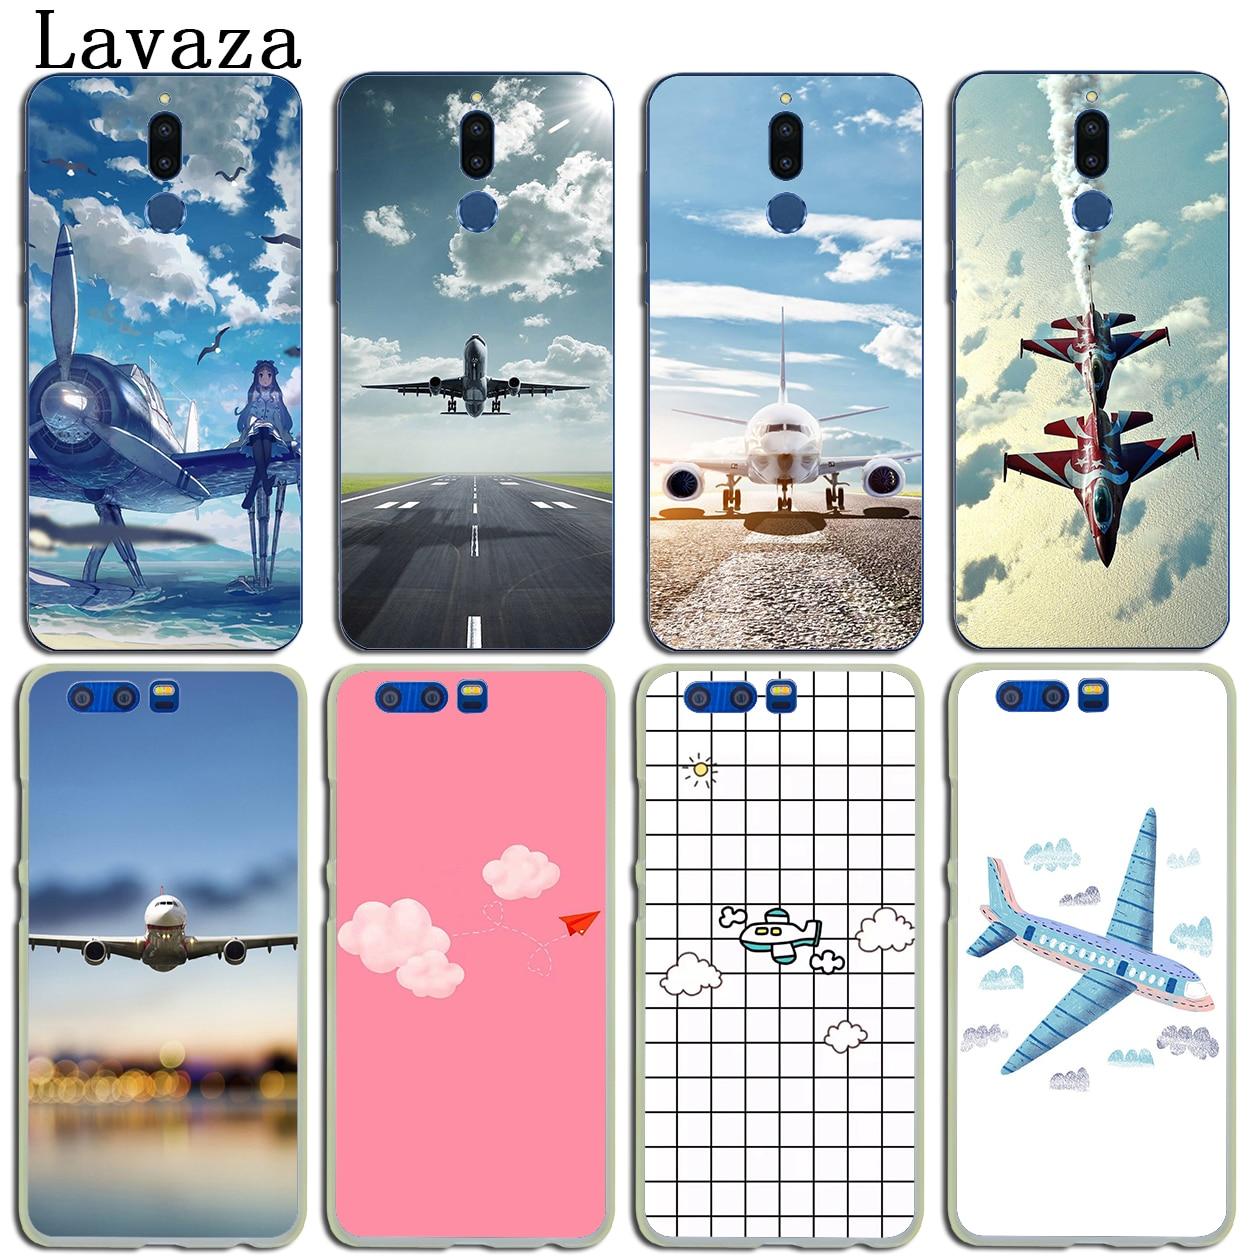 Lavaza aircraft sky airport Anime Hard Case for Huawei Y6 Y5 Y3 II Y7 2017 Nova 2 Plus 2S 2i Honor 9 8 Lite 6 6A 6X 7 7X